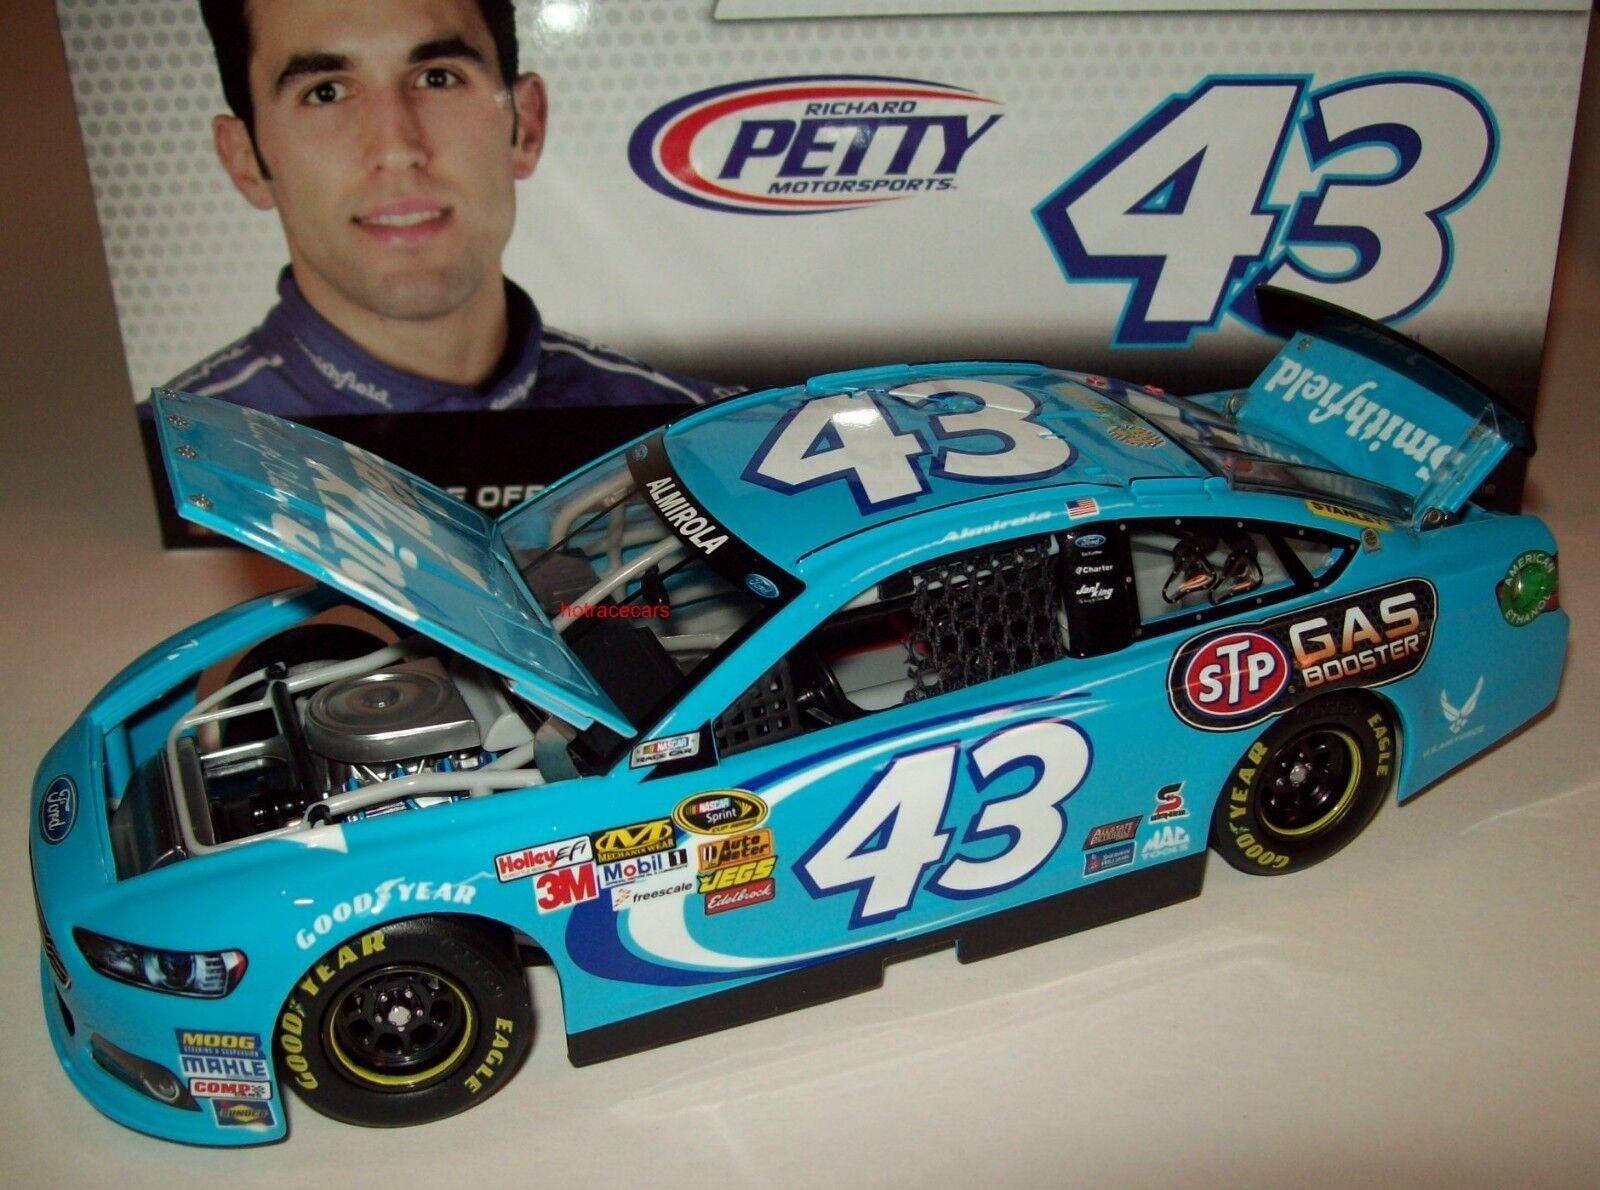 Aric Almirola 2013 Jani King Richard Richard Richard Petty Ford Fusion 1 24 NASCAR Diecast 81ebce